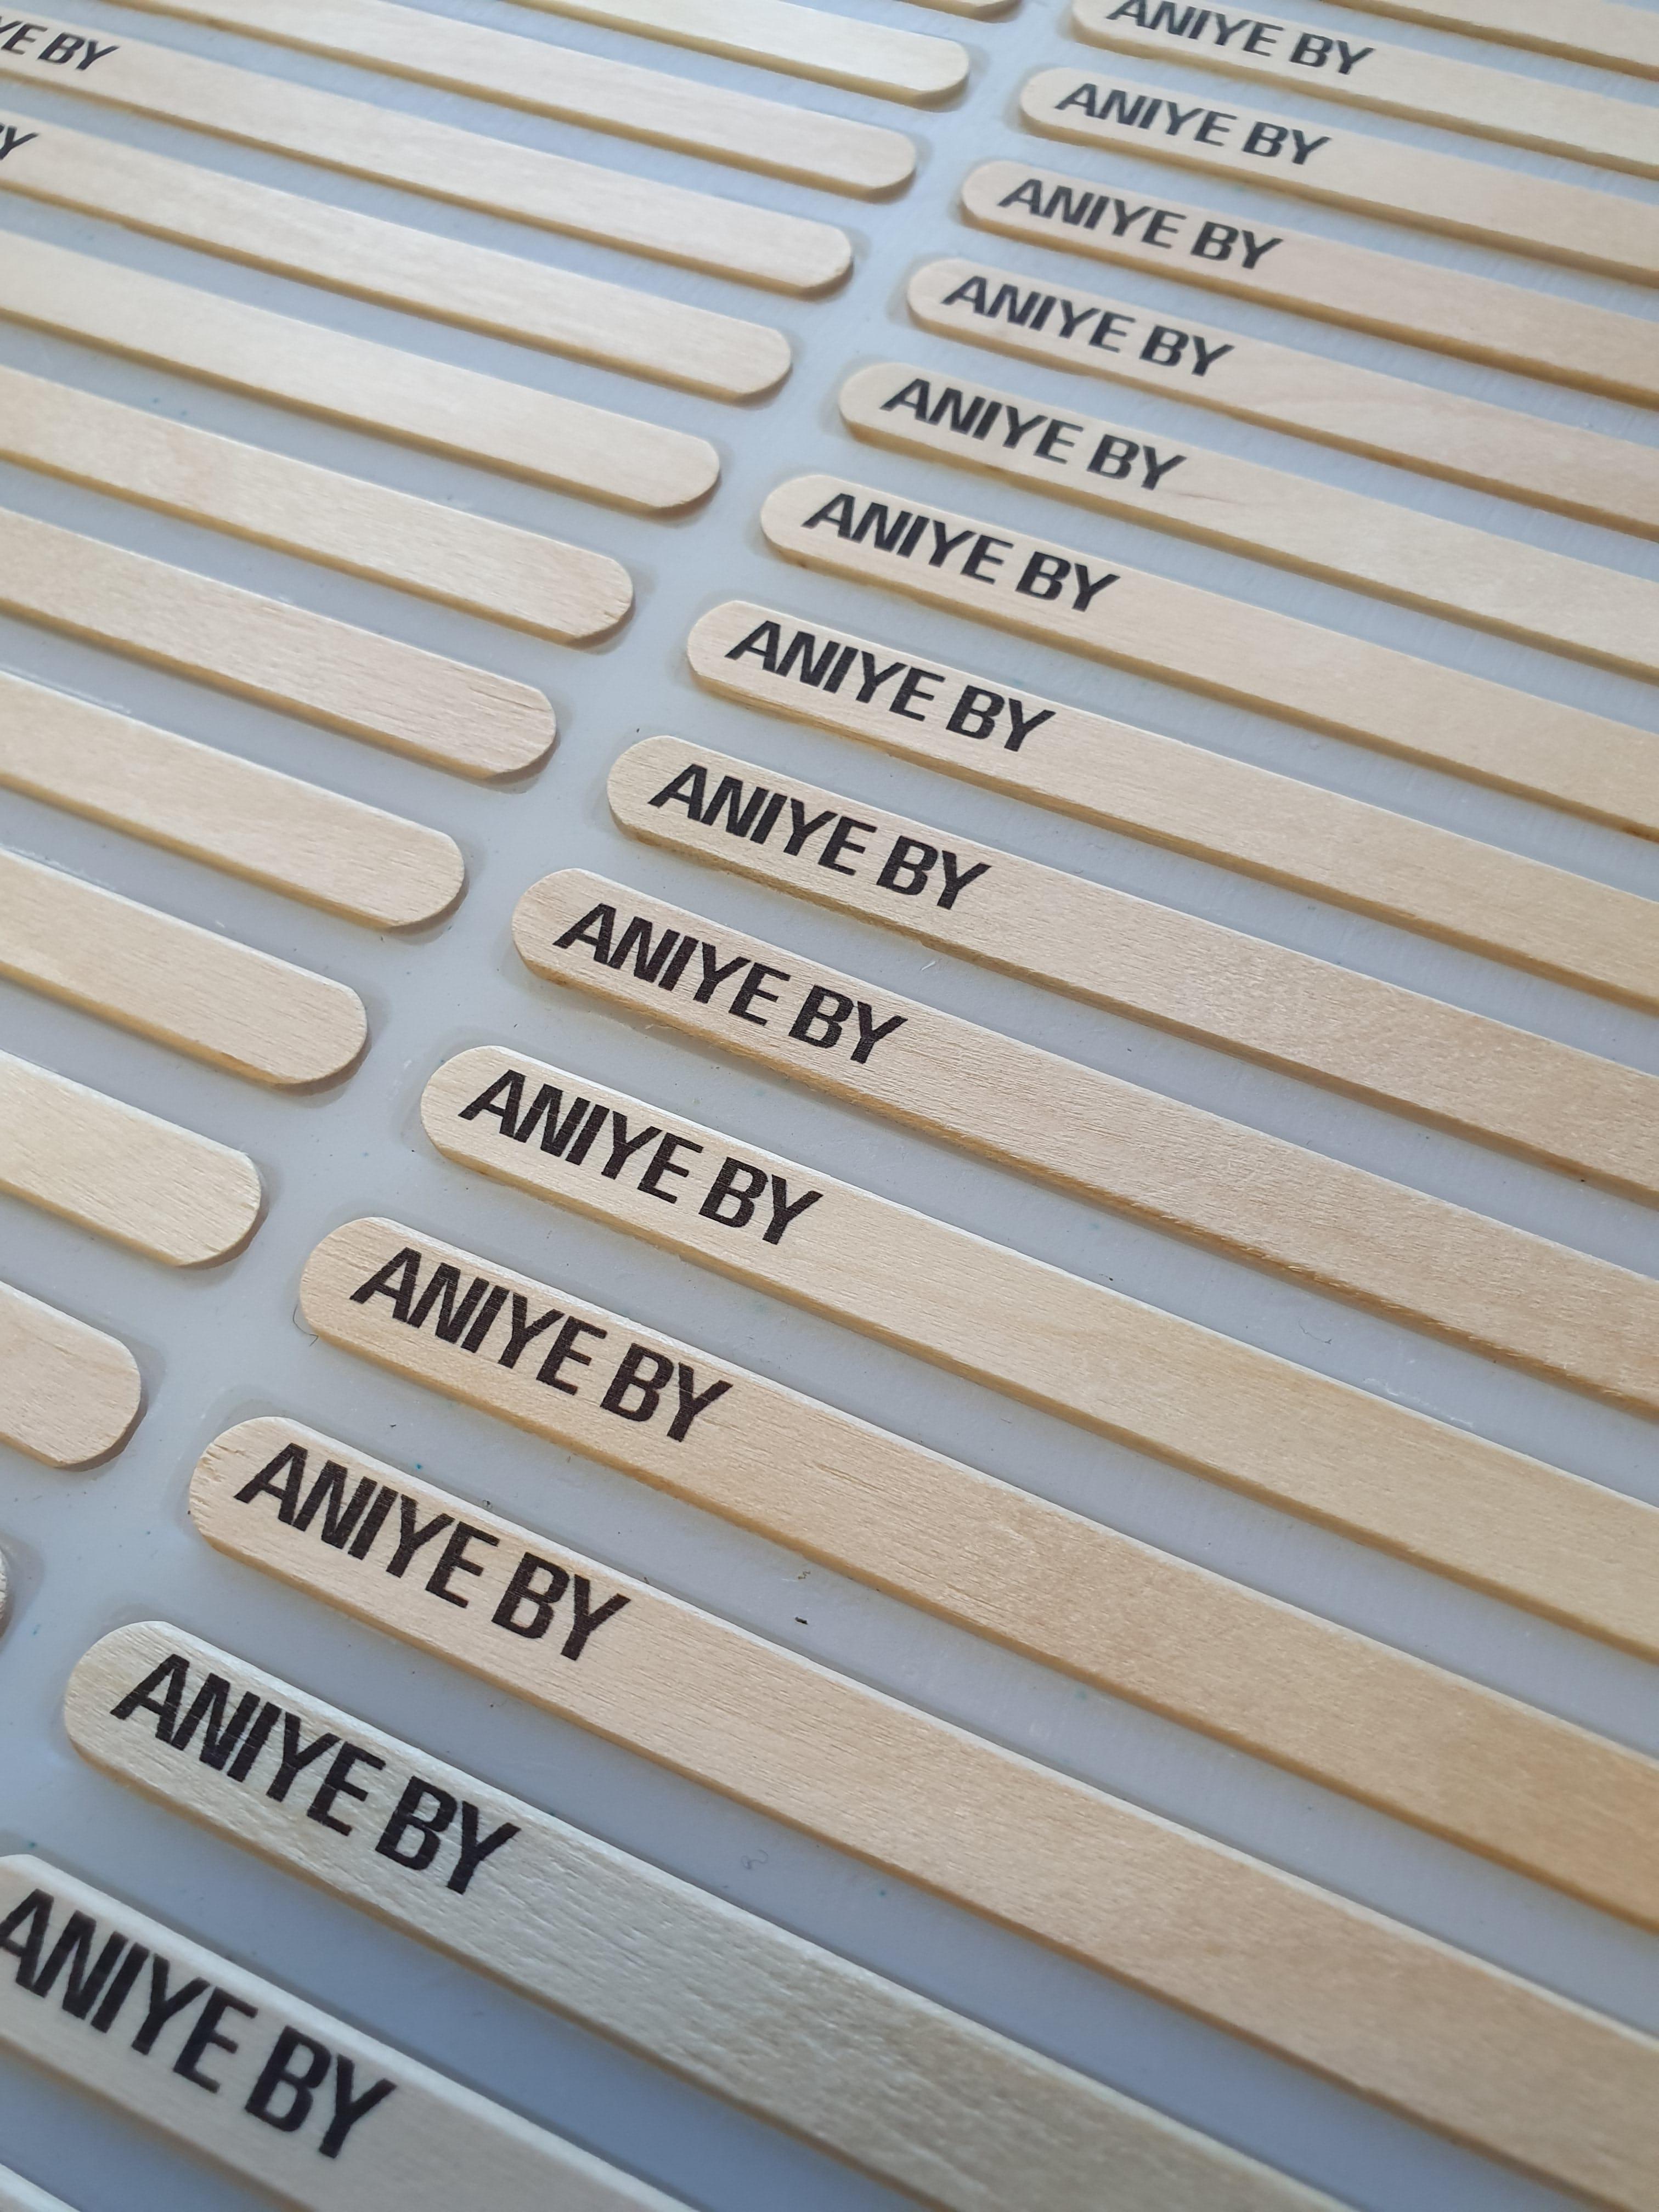 stecchi-personalizzati-aniye-by.jpg